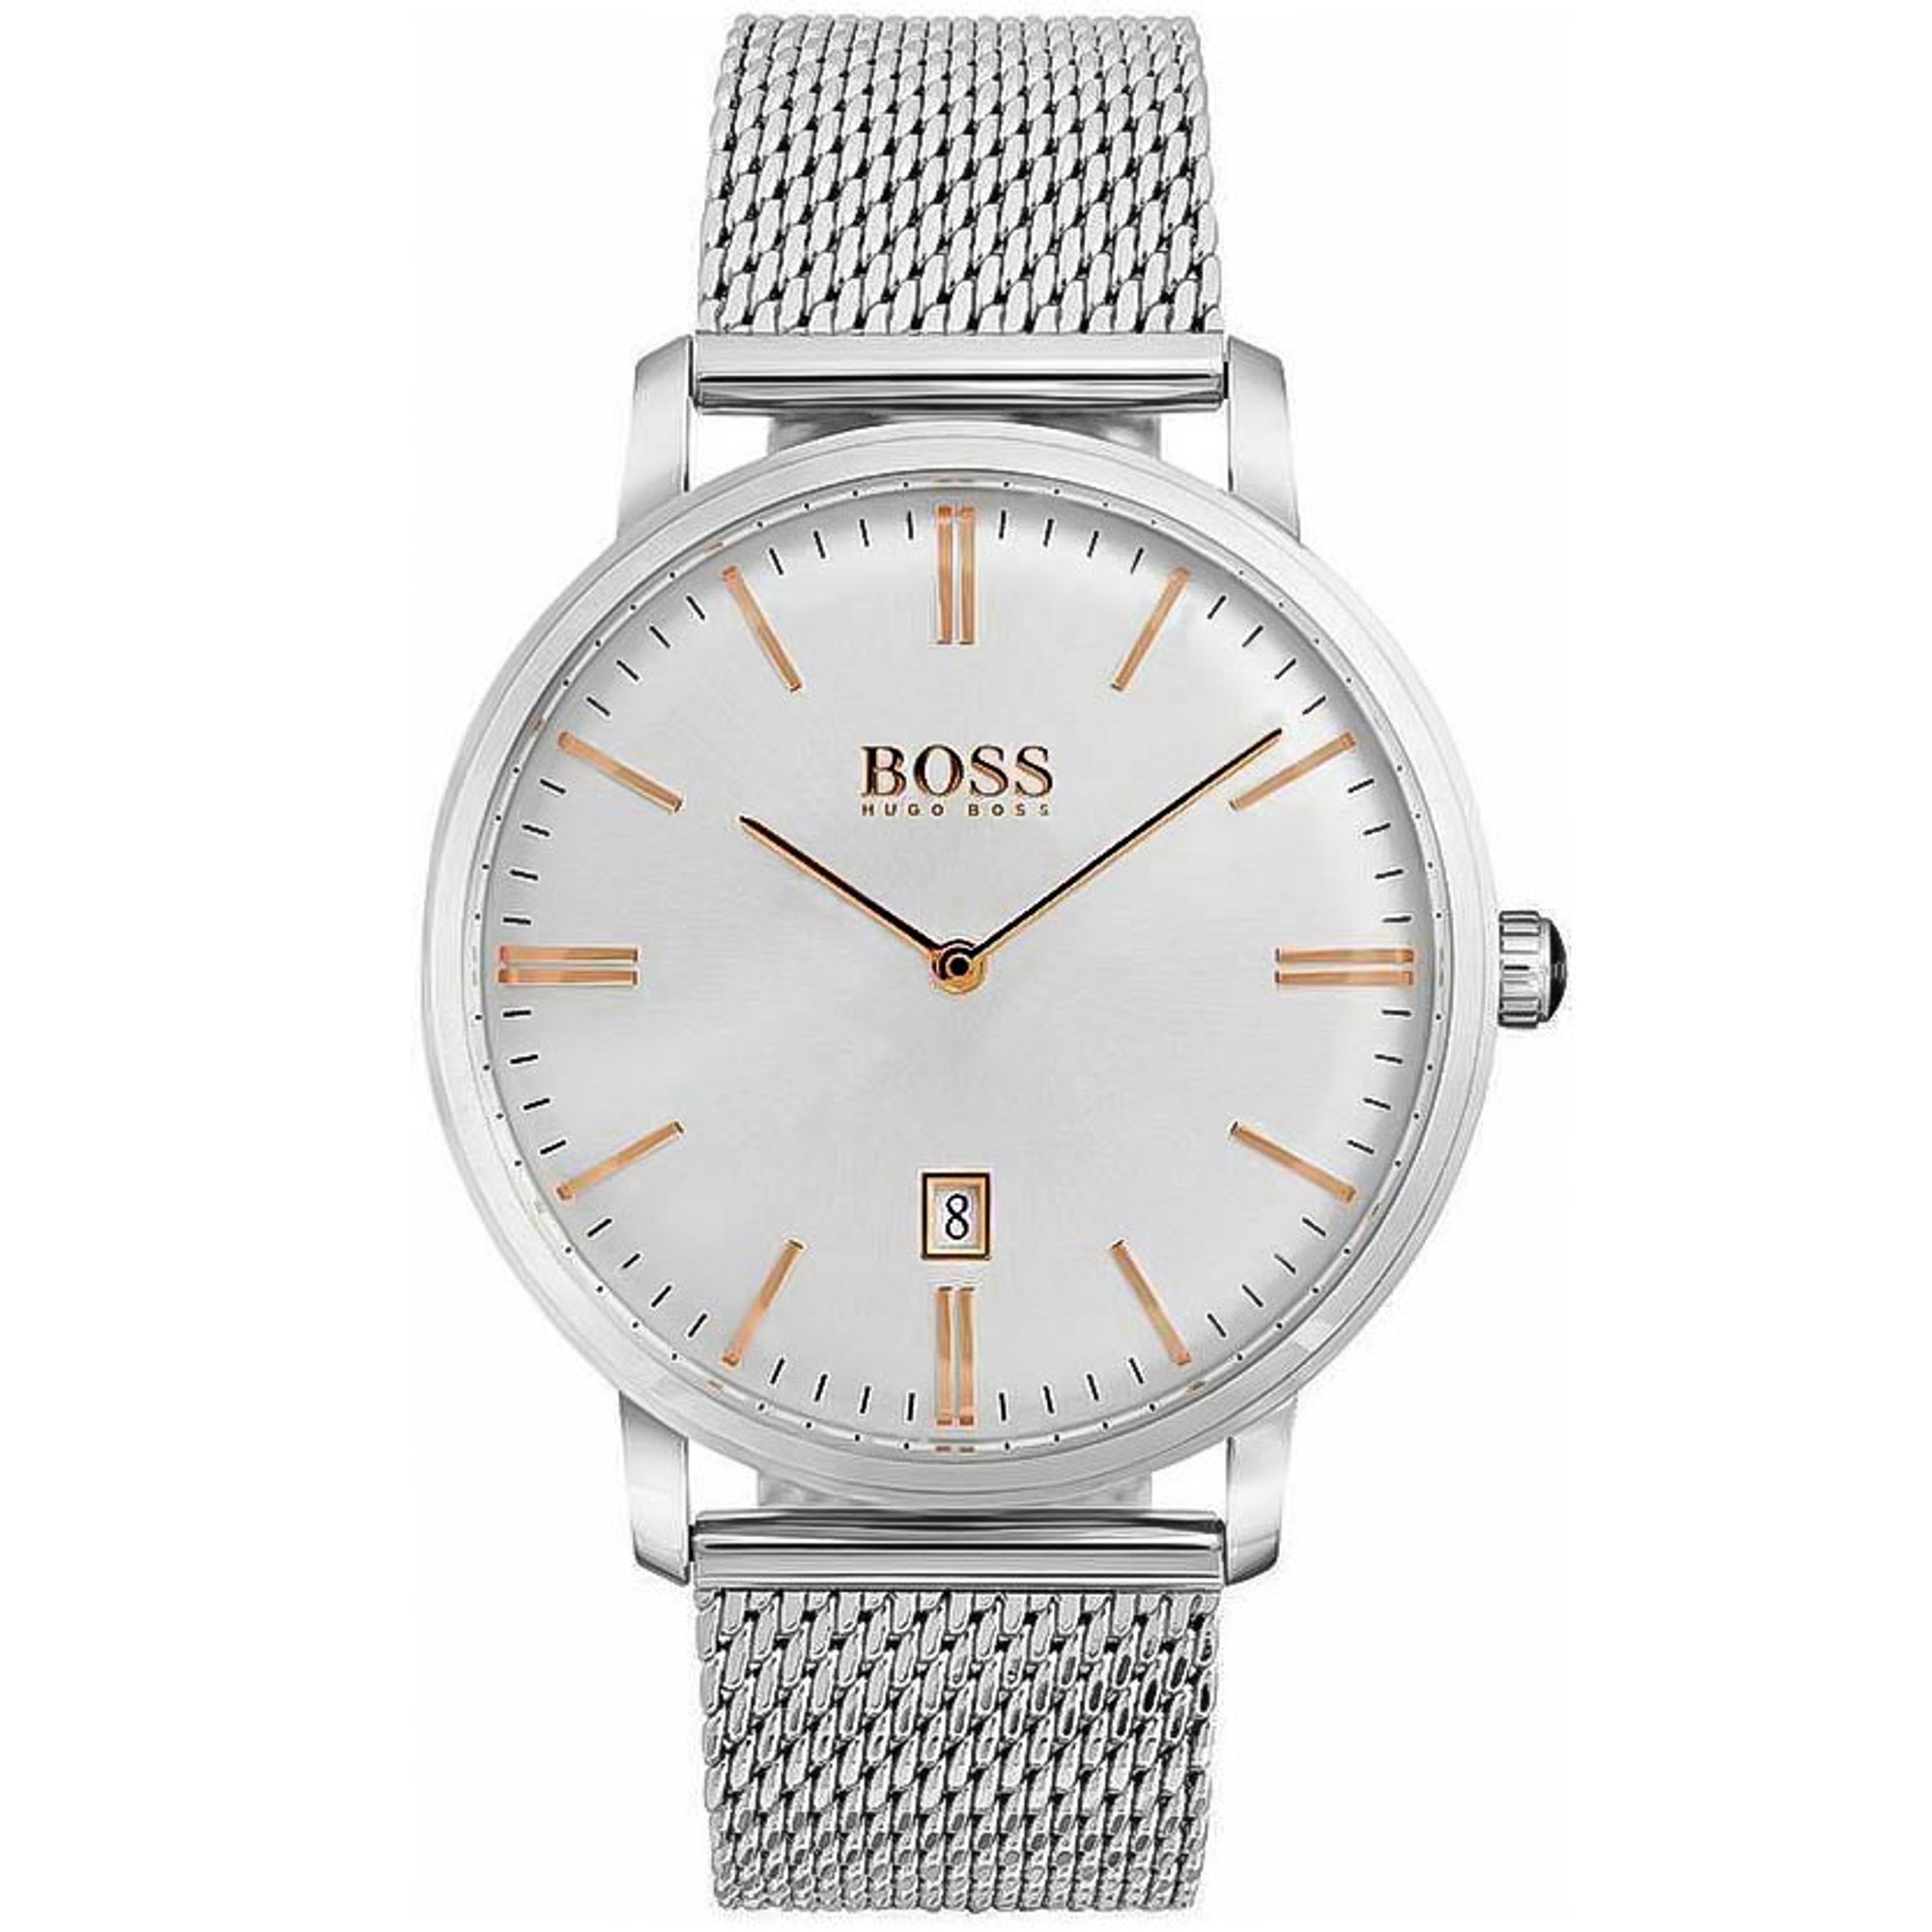 HUGO BOSS Tradition Quarz Armbanduhr 1513481